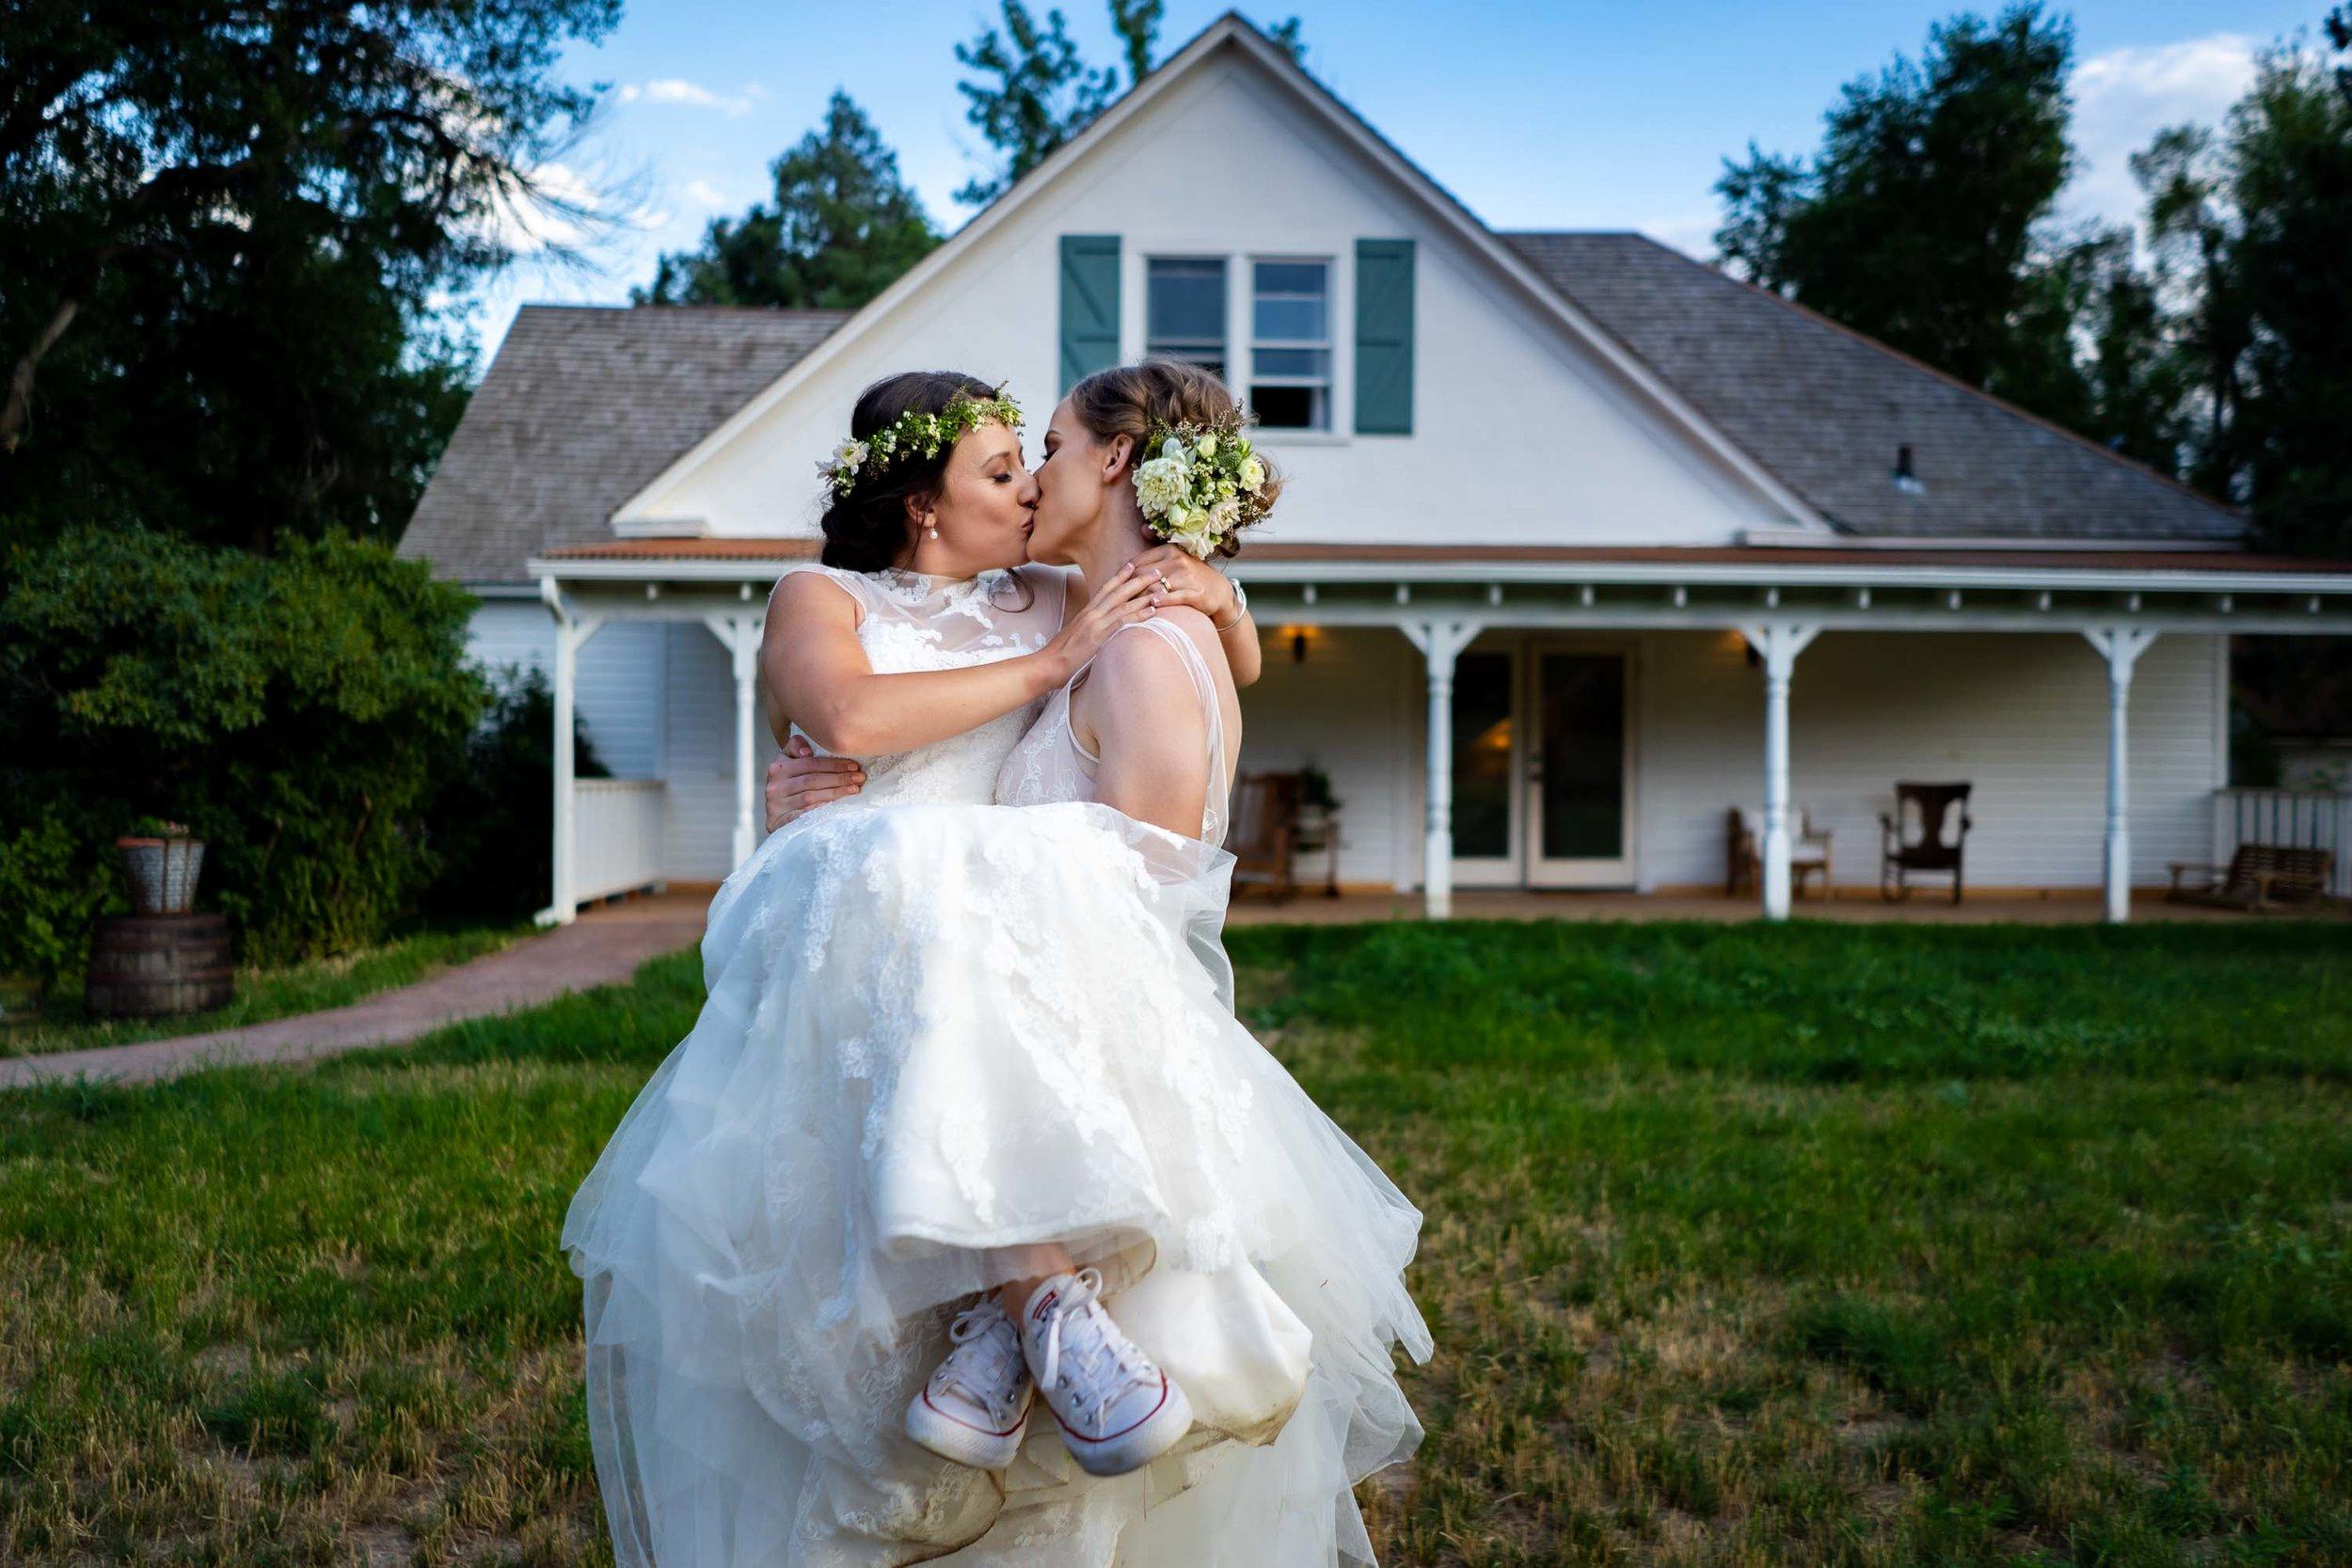 Rist_Canyon_Inn_Laporte_Wedding-144.jpg